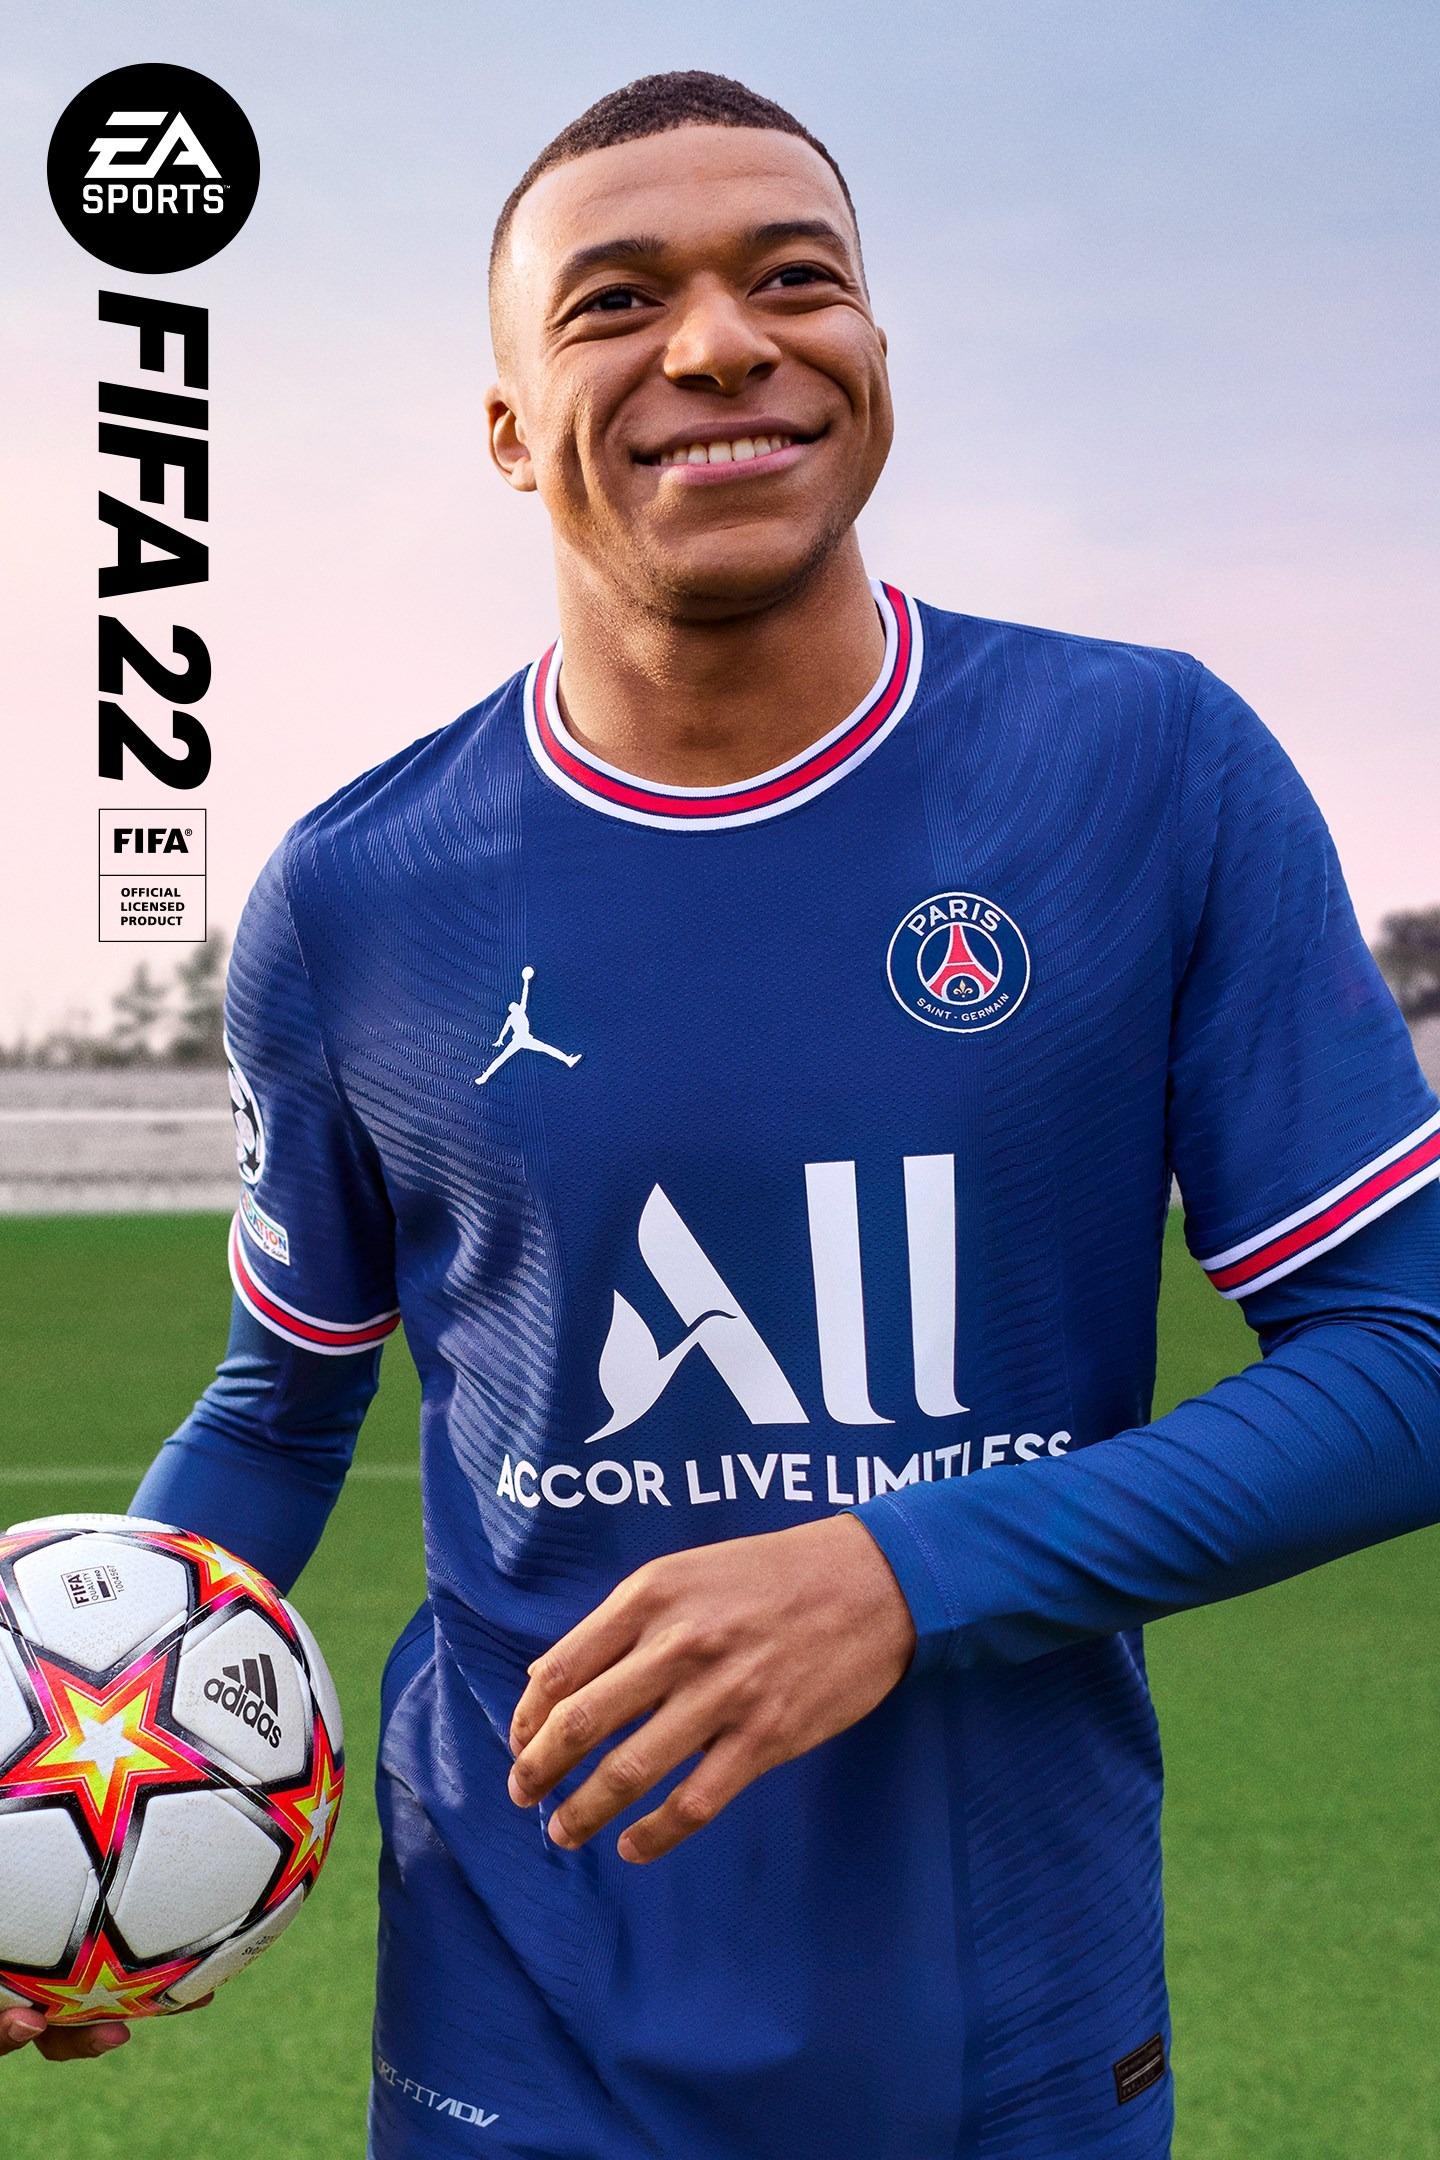 Постер FIFA 22